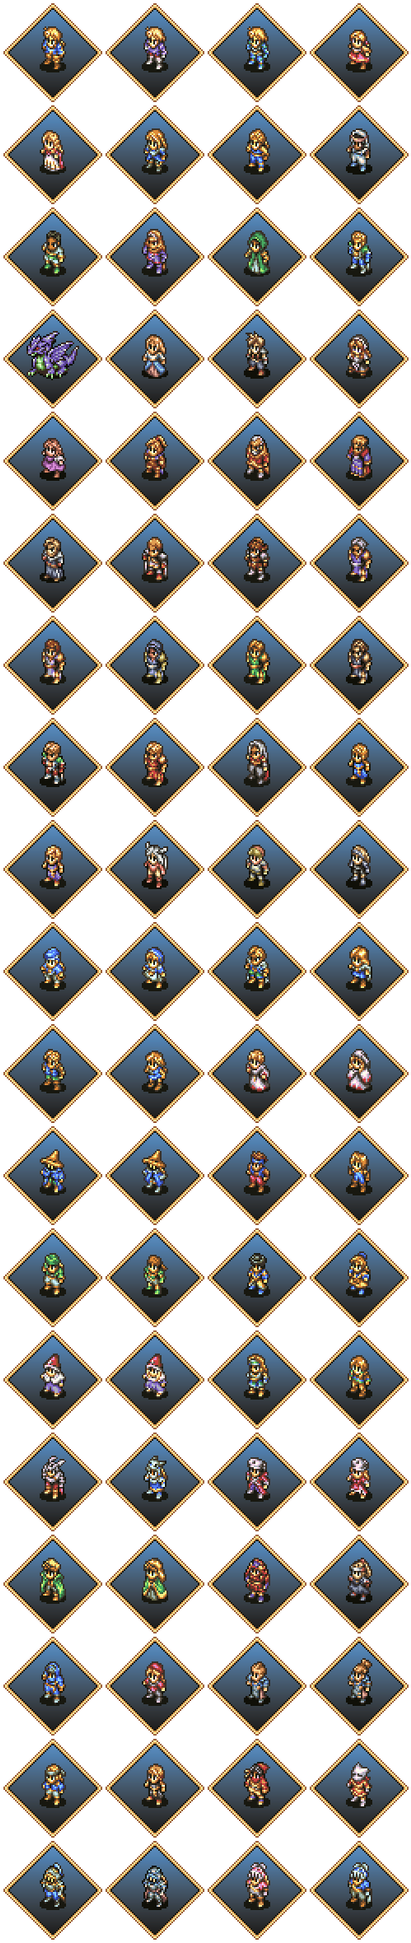 Final Fantasy Tactics Sprites by Humble-Novice